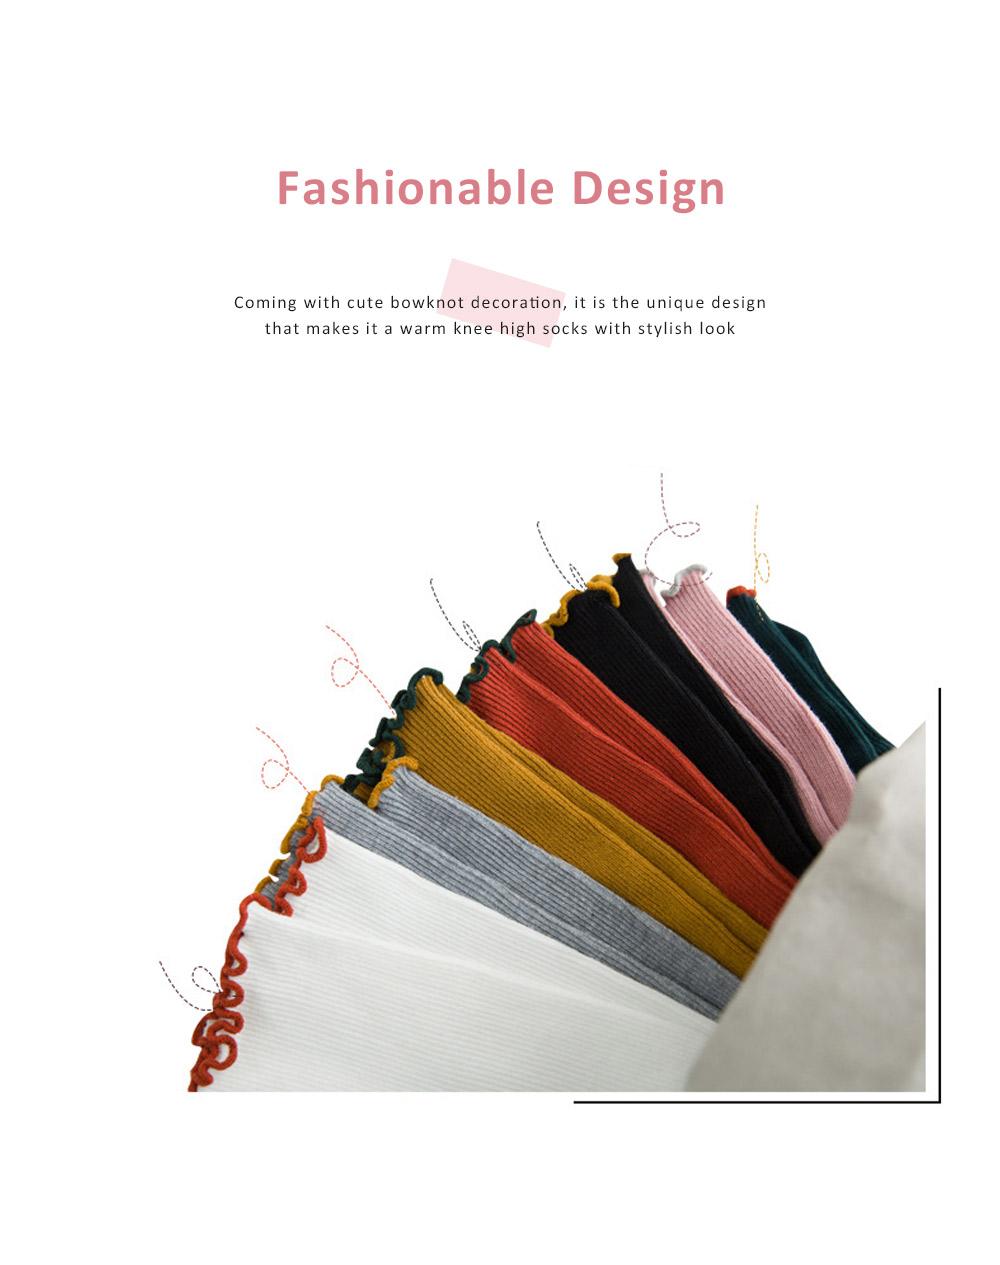 Korean Style Knee High Socks Cute Bowknot Cotton Knit Dress Socks Ruffled Shape Baby Stocking for Girls 1